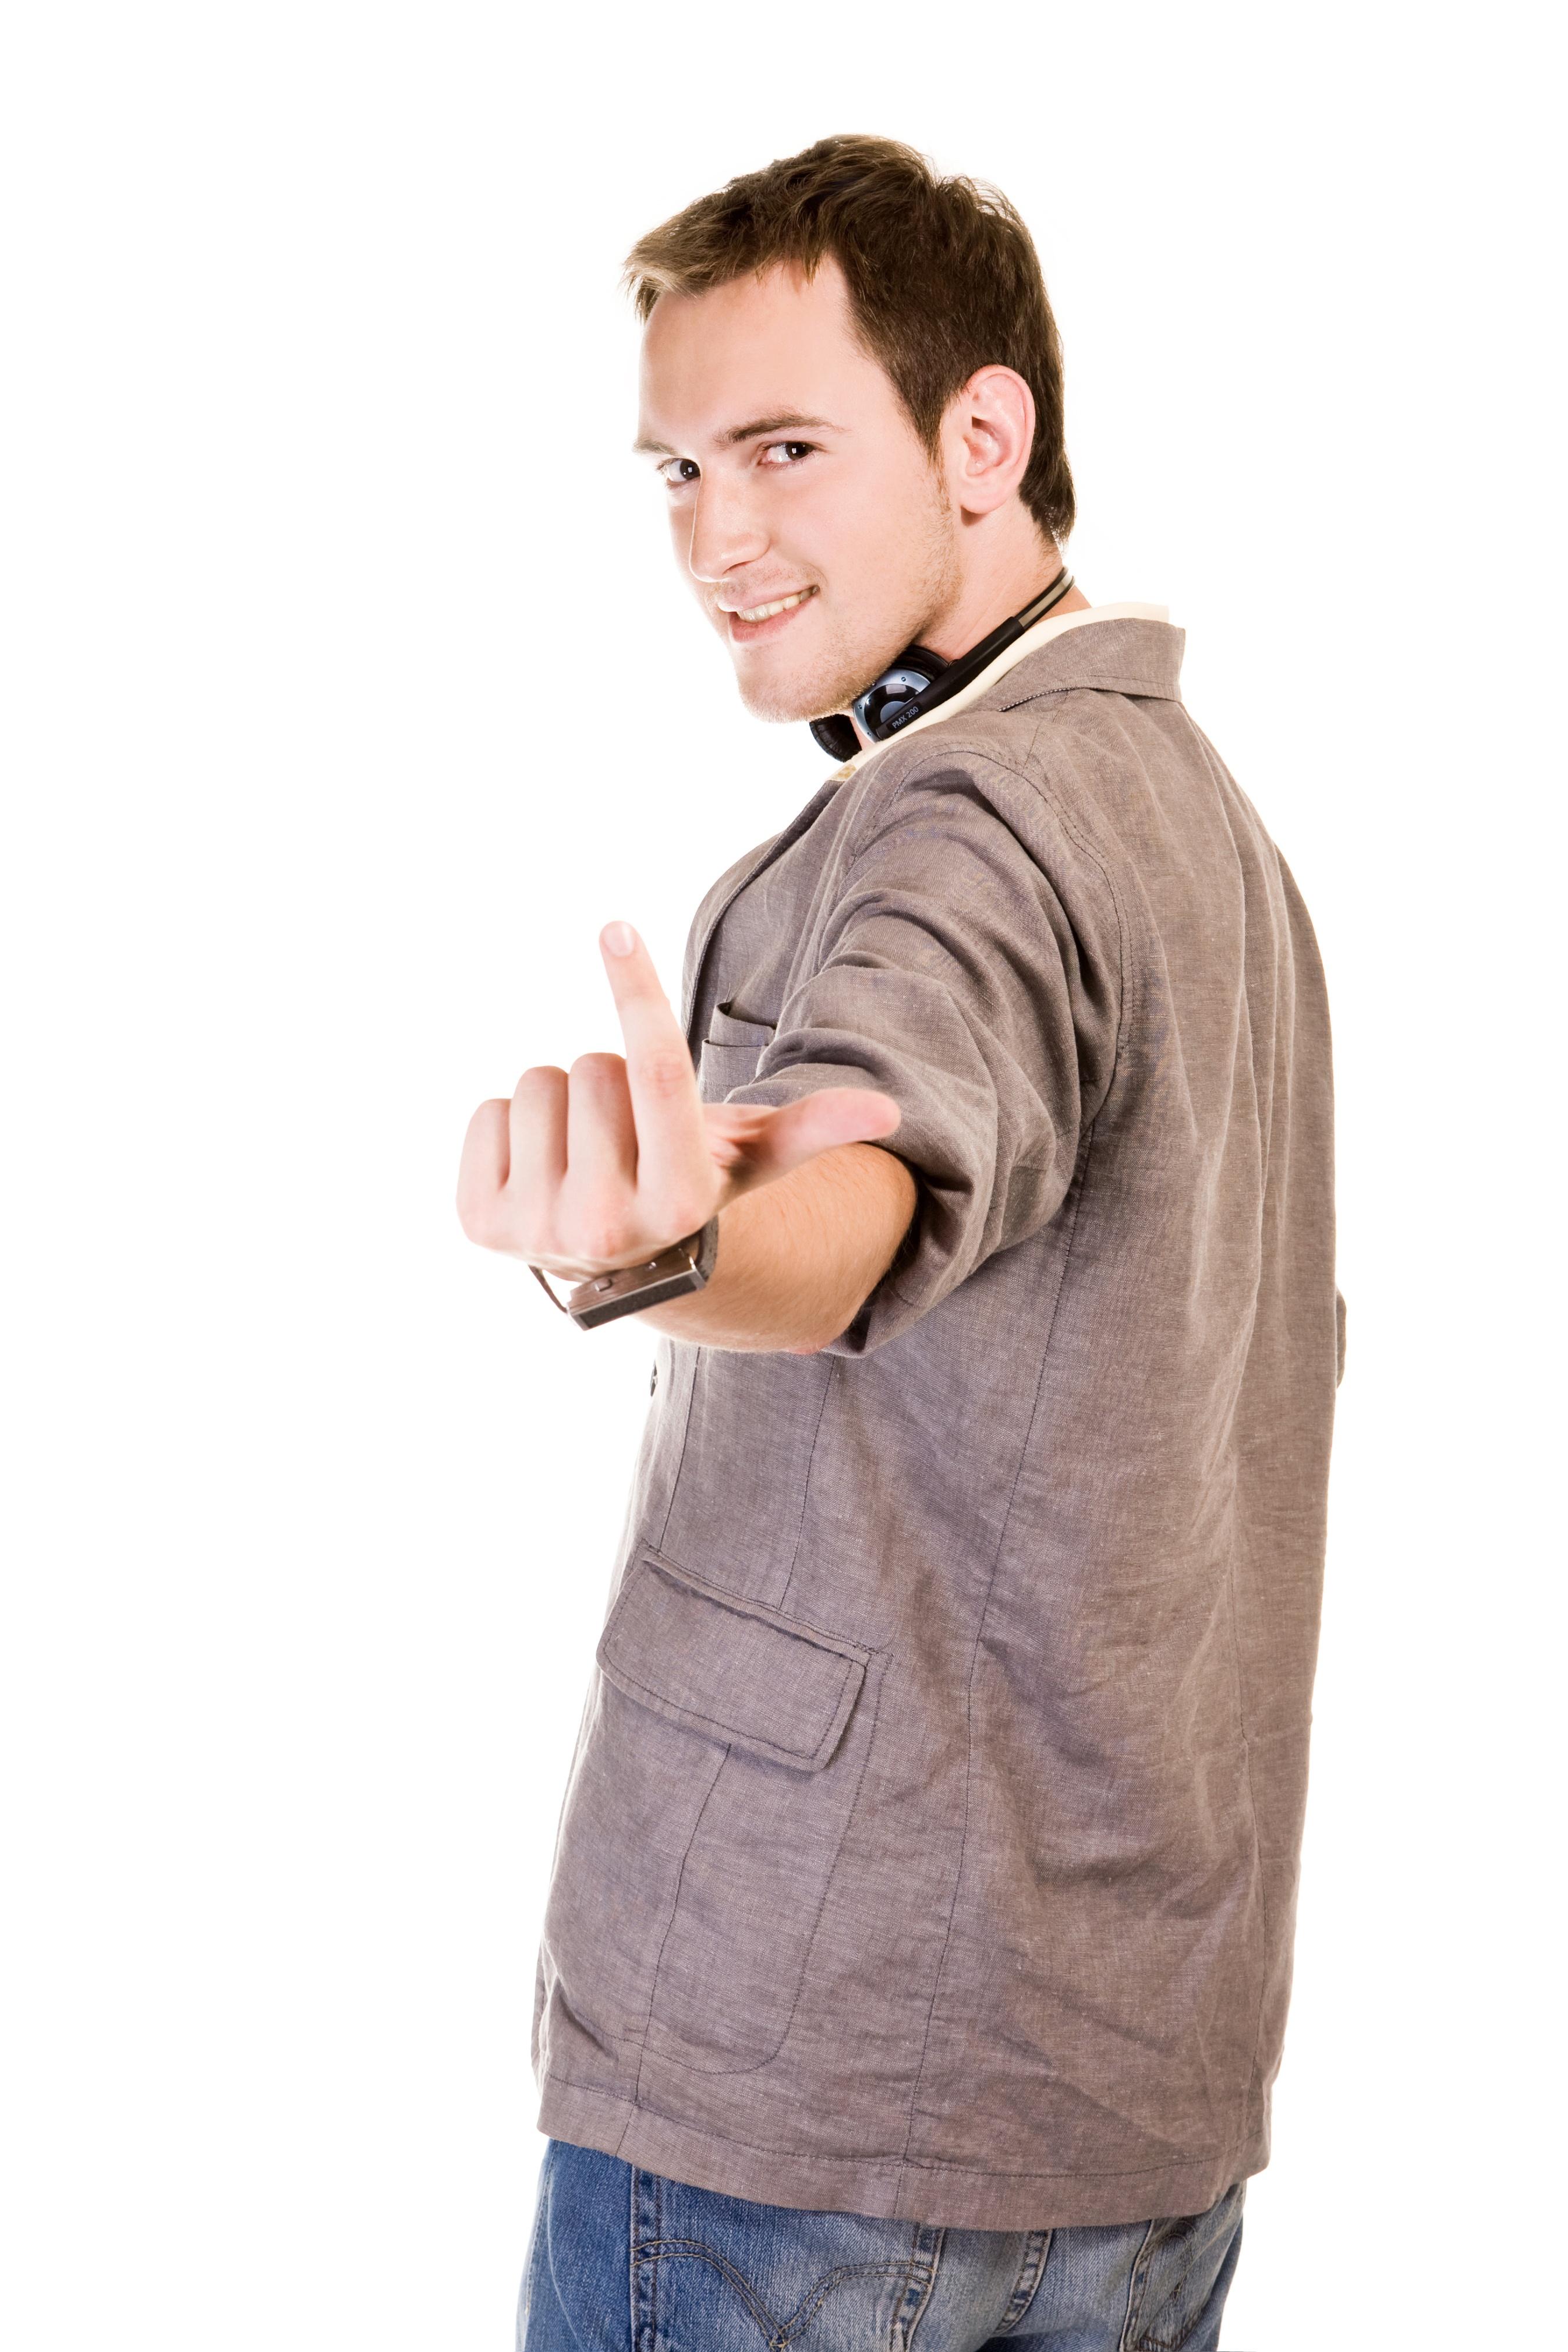 stockvault-attractive-young-man112056.jpg